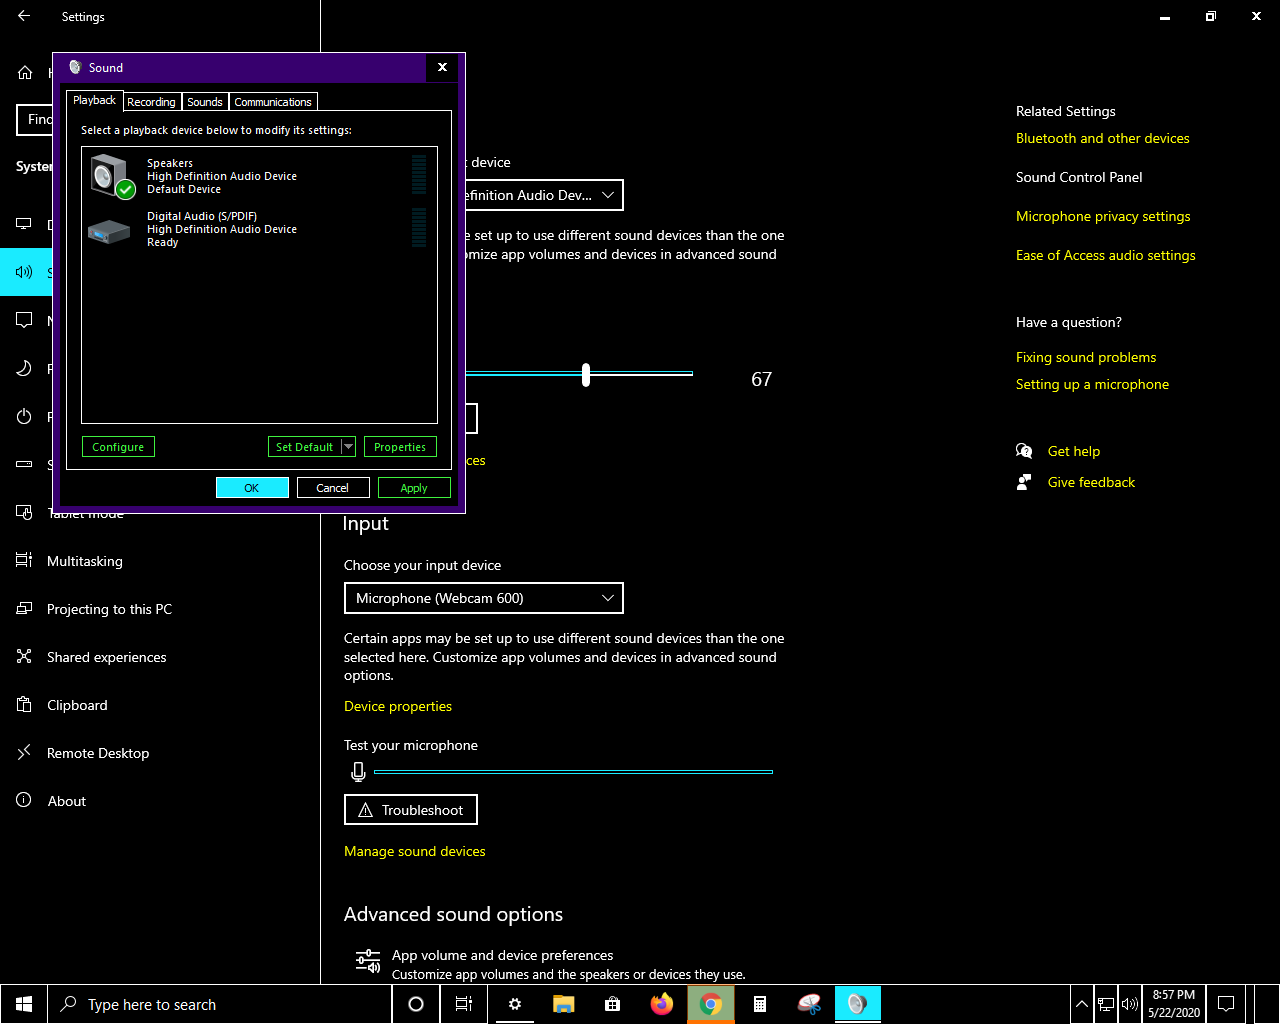 5ec8572e15af9_Screenshot(6).png.176d25b8beafcfcc436f94b6f9c50a97.png